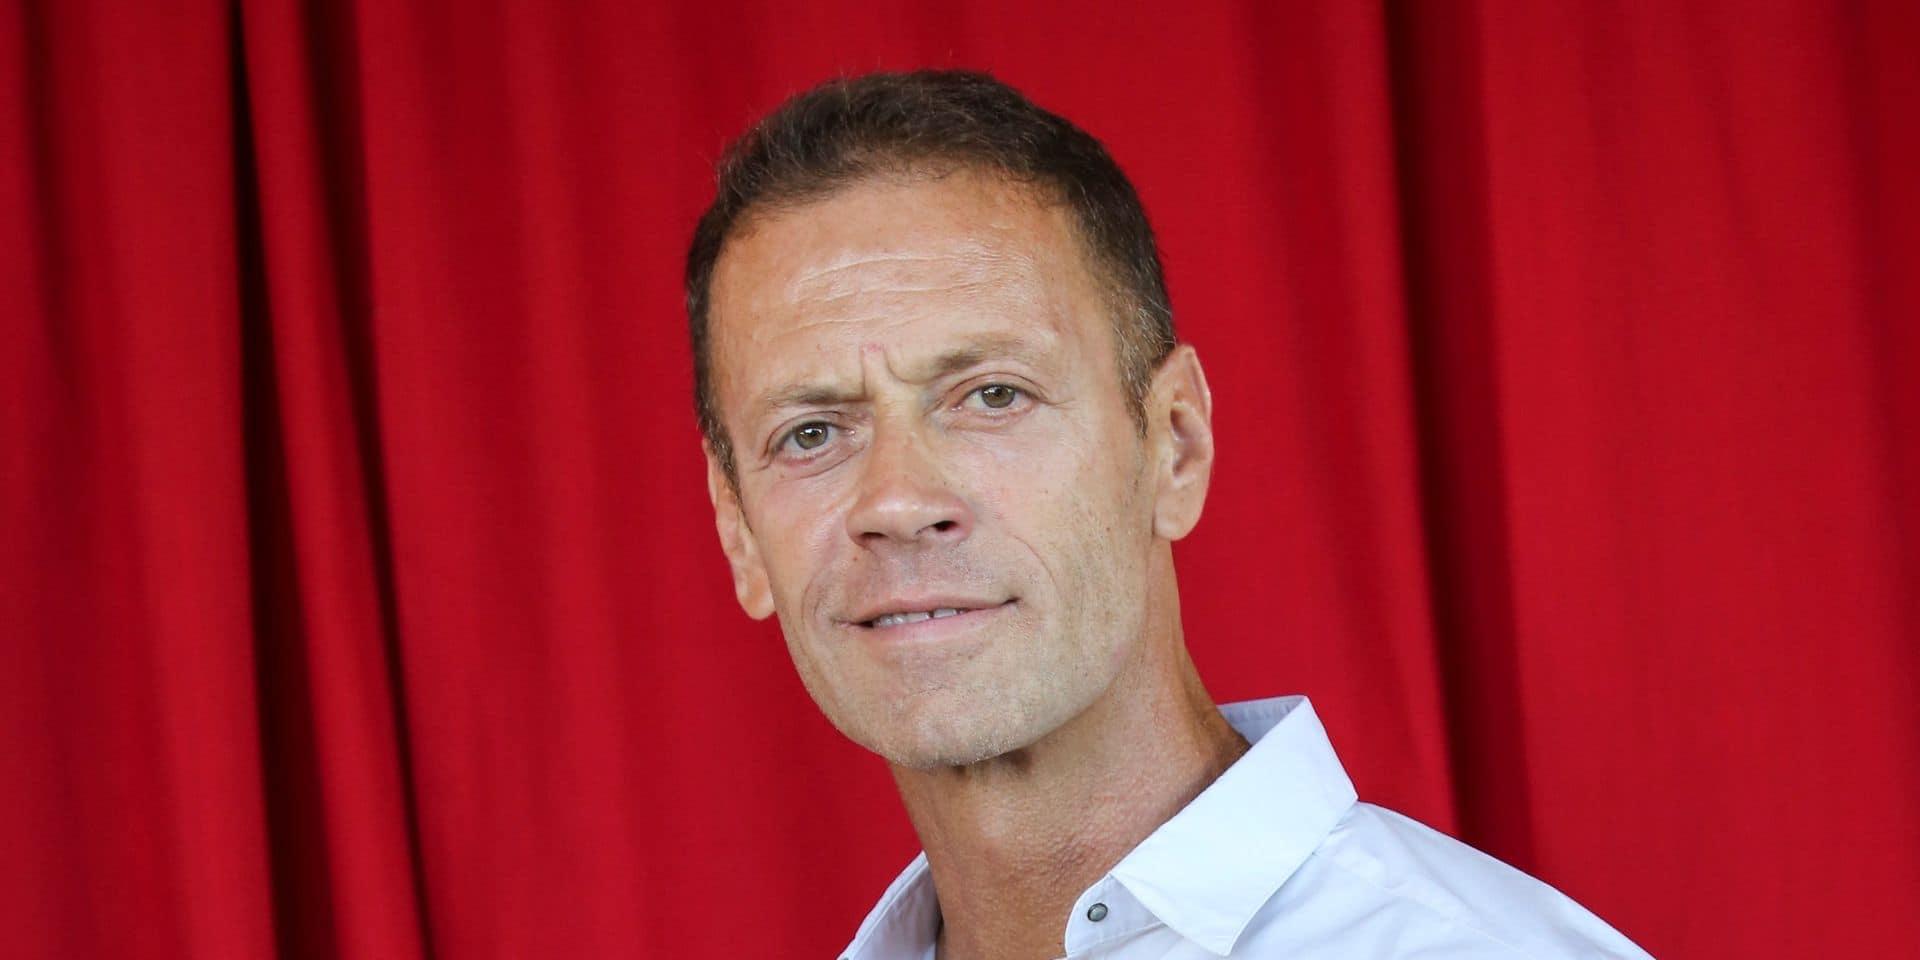 Rocco Siffredi testé positif au coronavirus